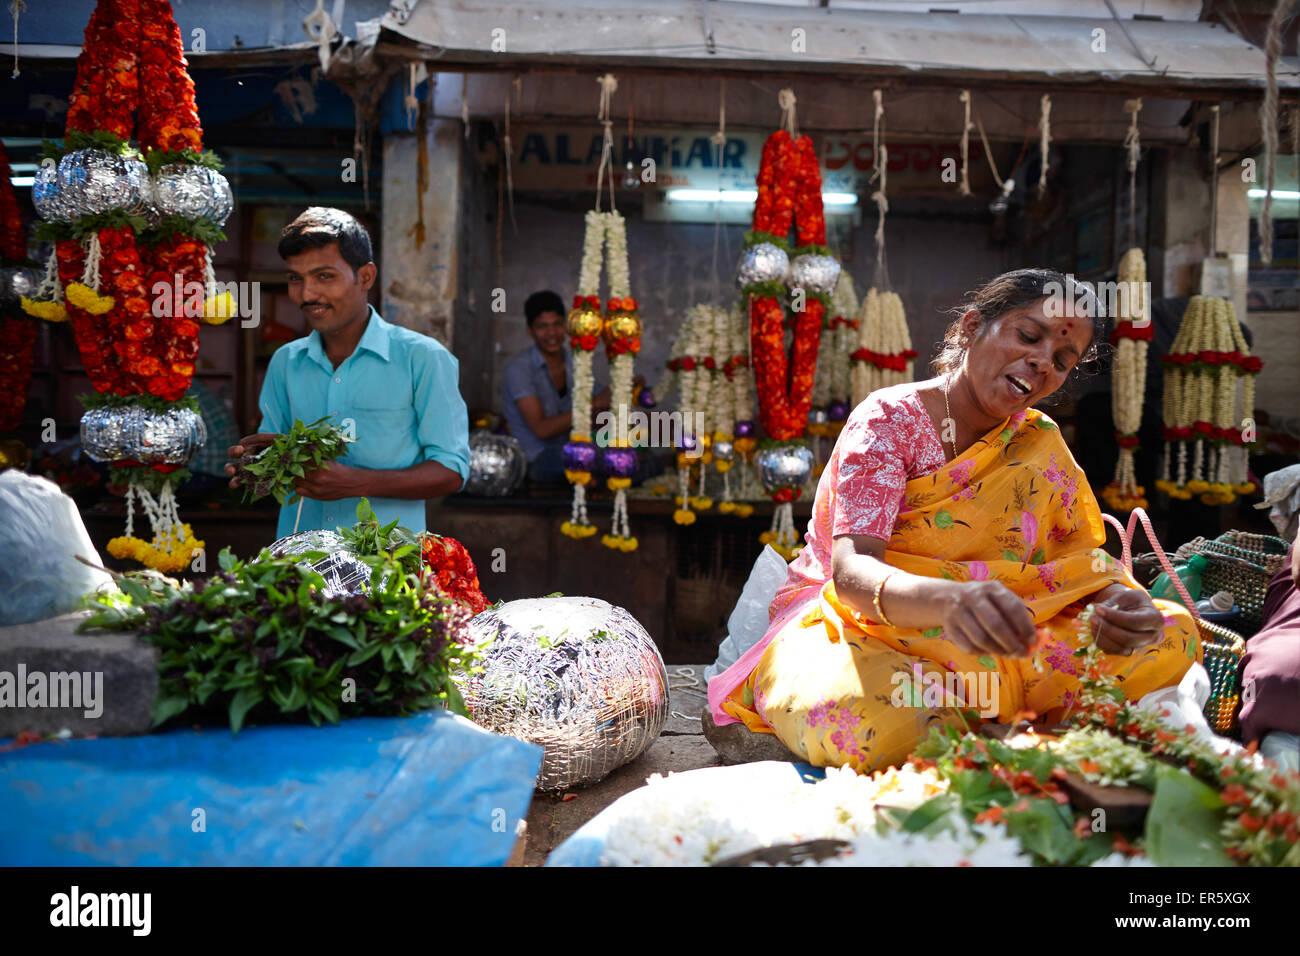 Woman stringing flower garland, Devaraja Market, Mysore, Karnataka, India - Stock Image